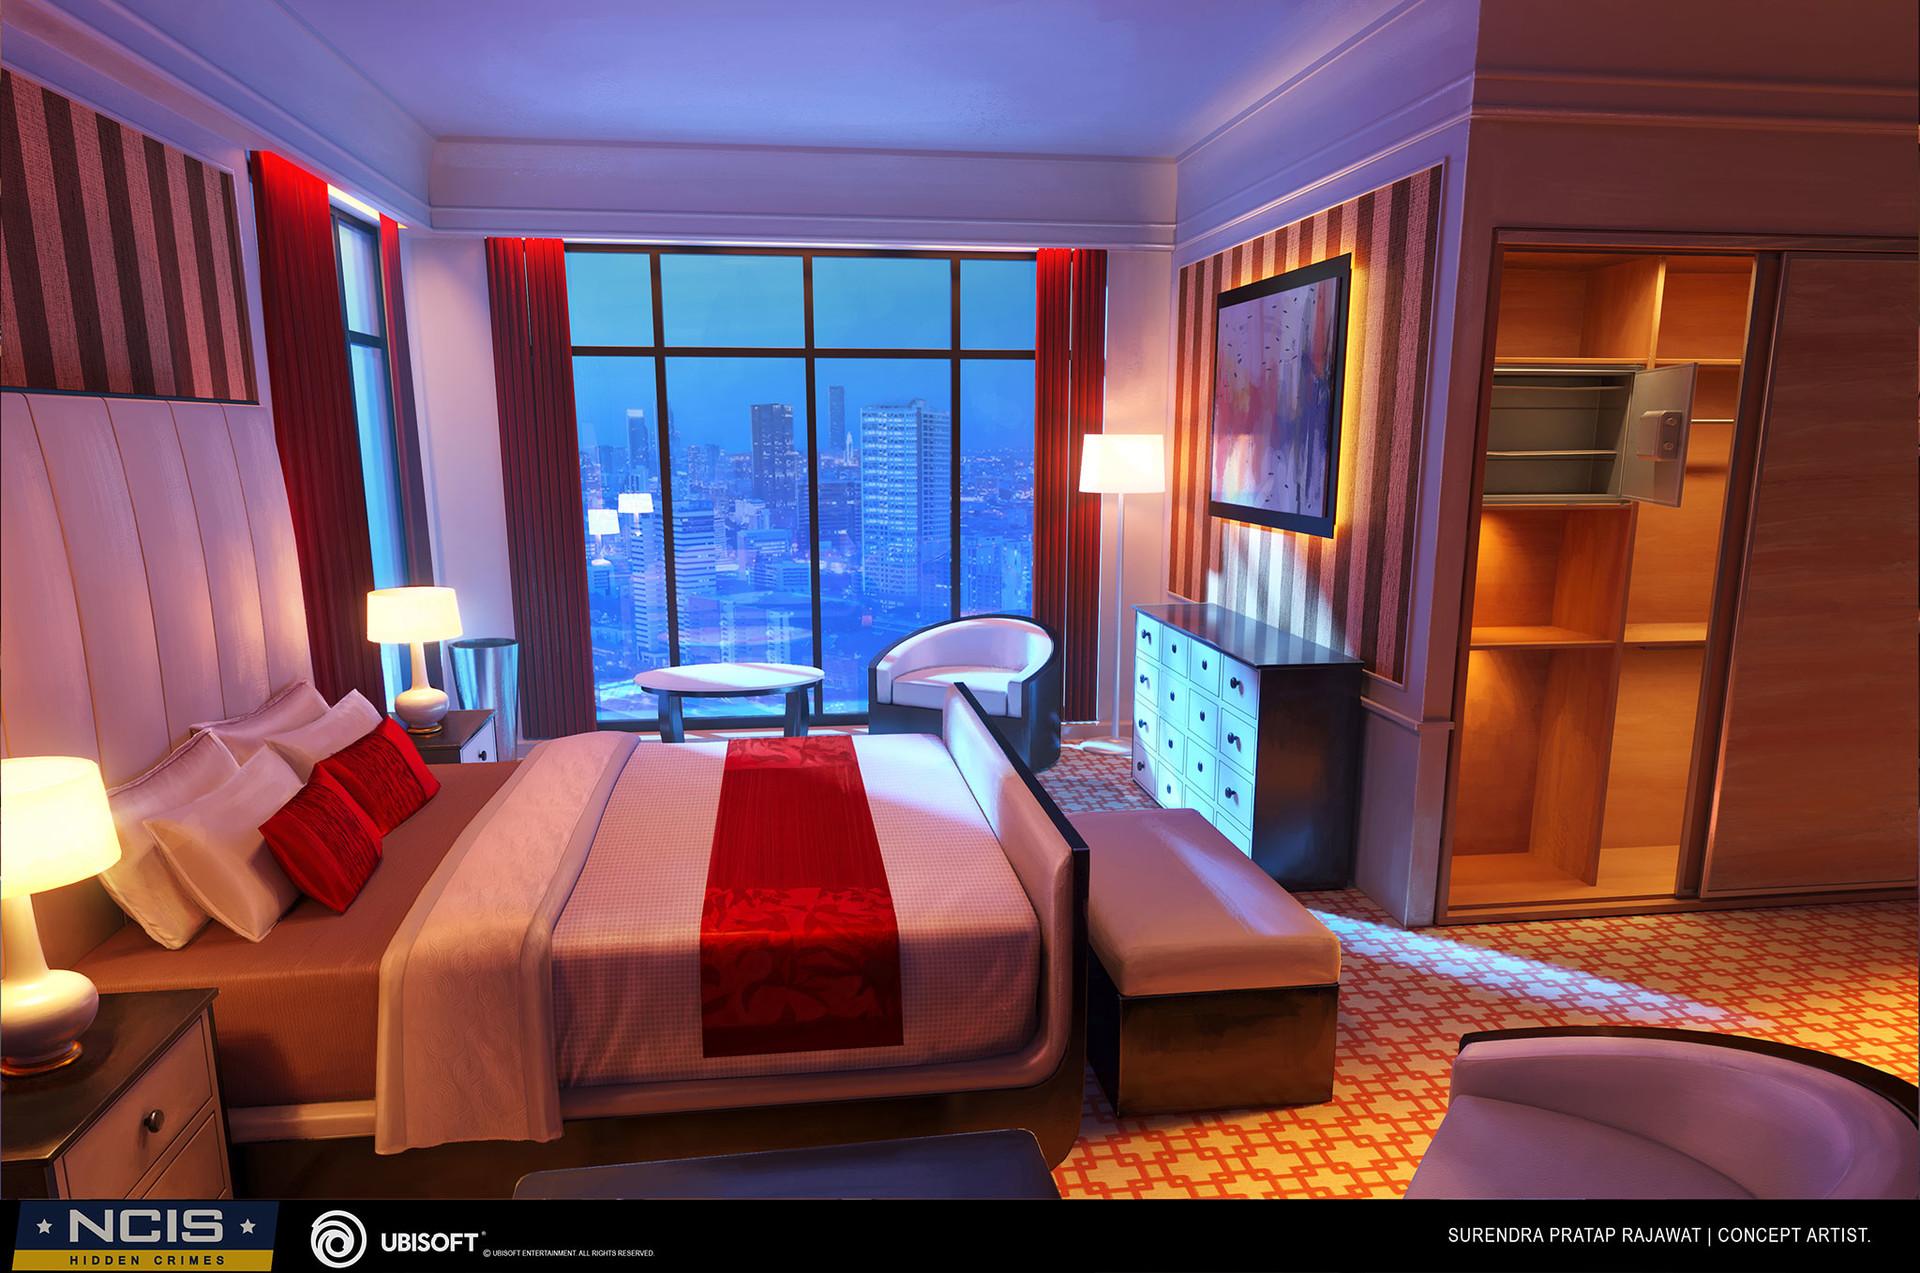 Surendra rajawat hotel room